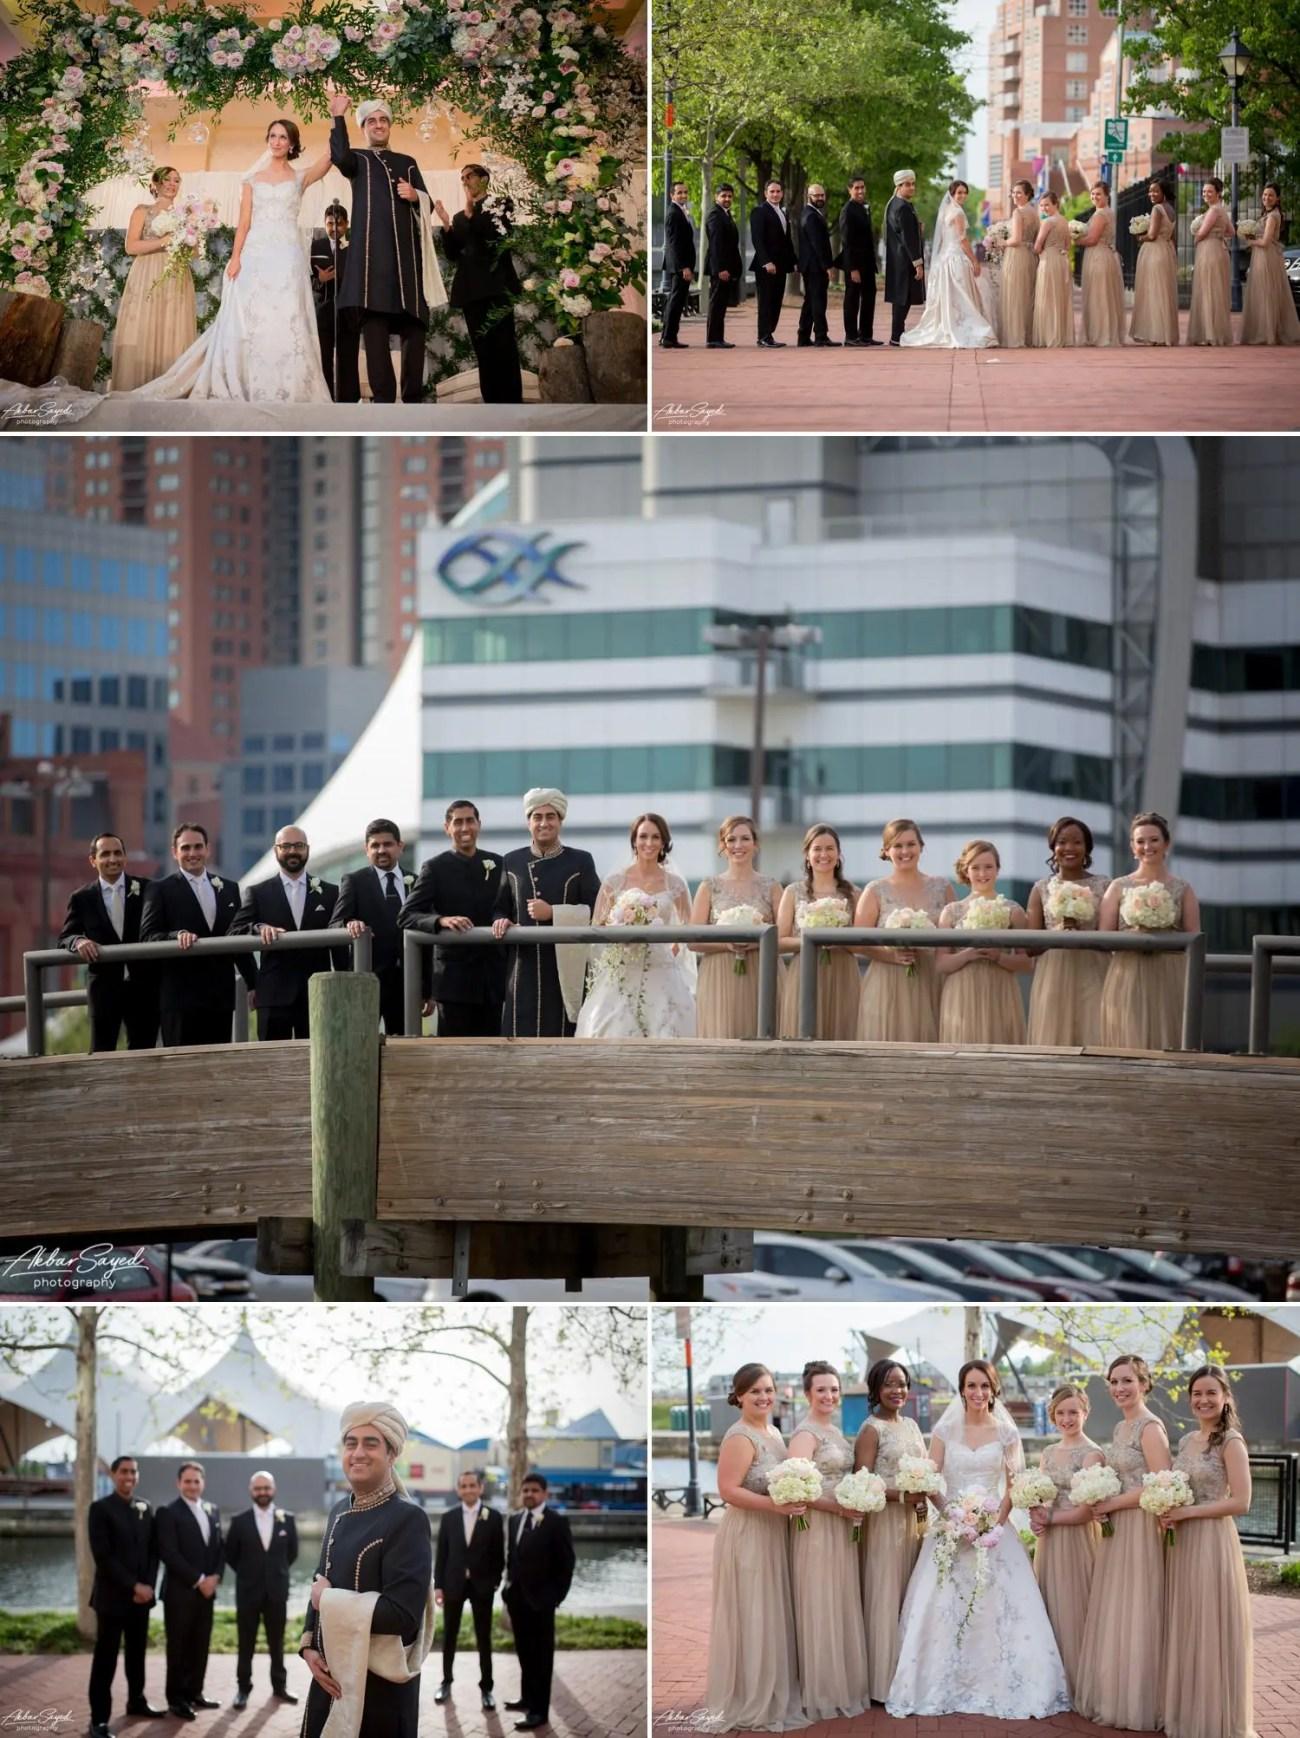 Kathleen and Ali - Baltimore Marriott Waterfront Wedding 11